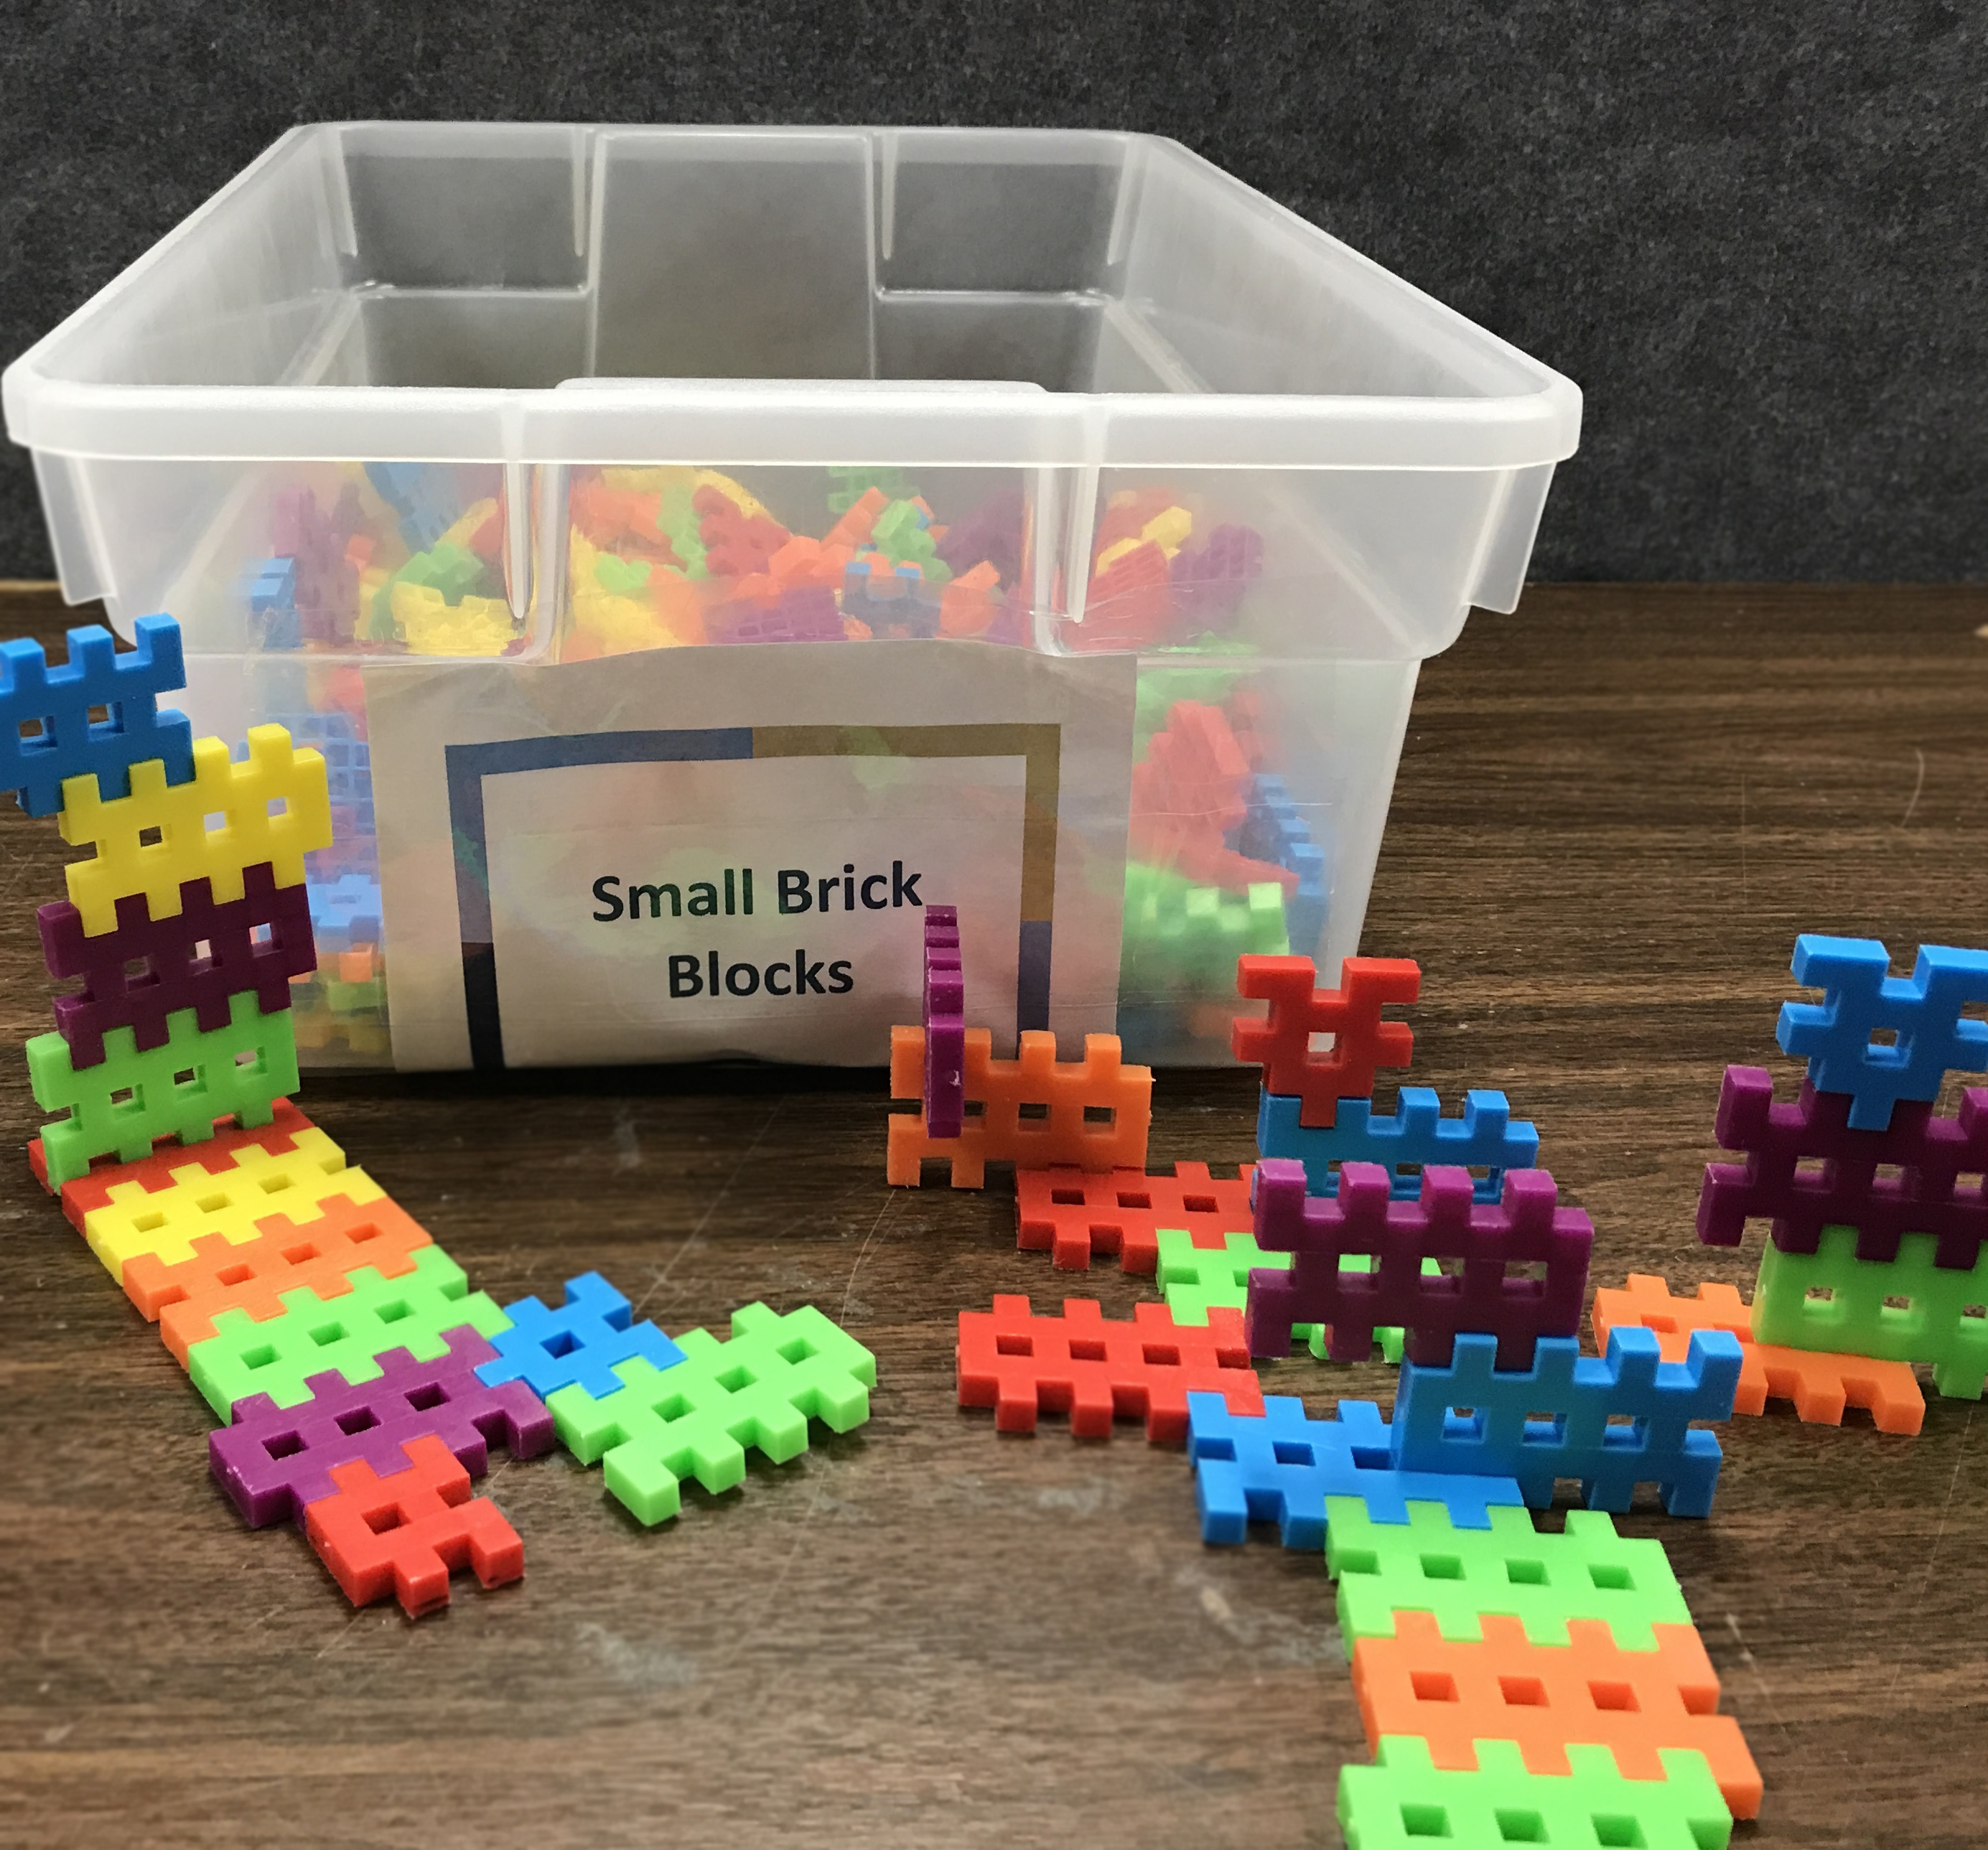 Small Brick Blocks